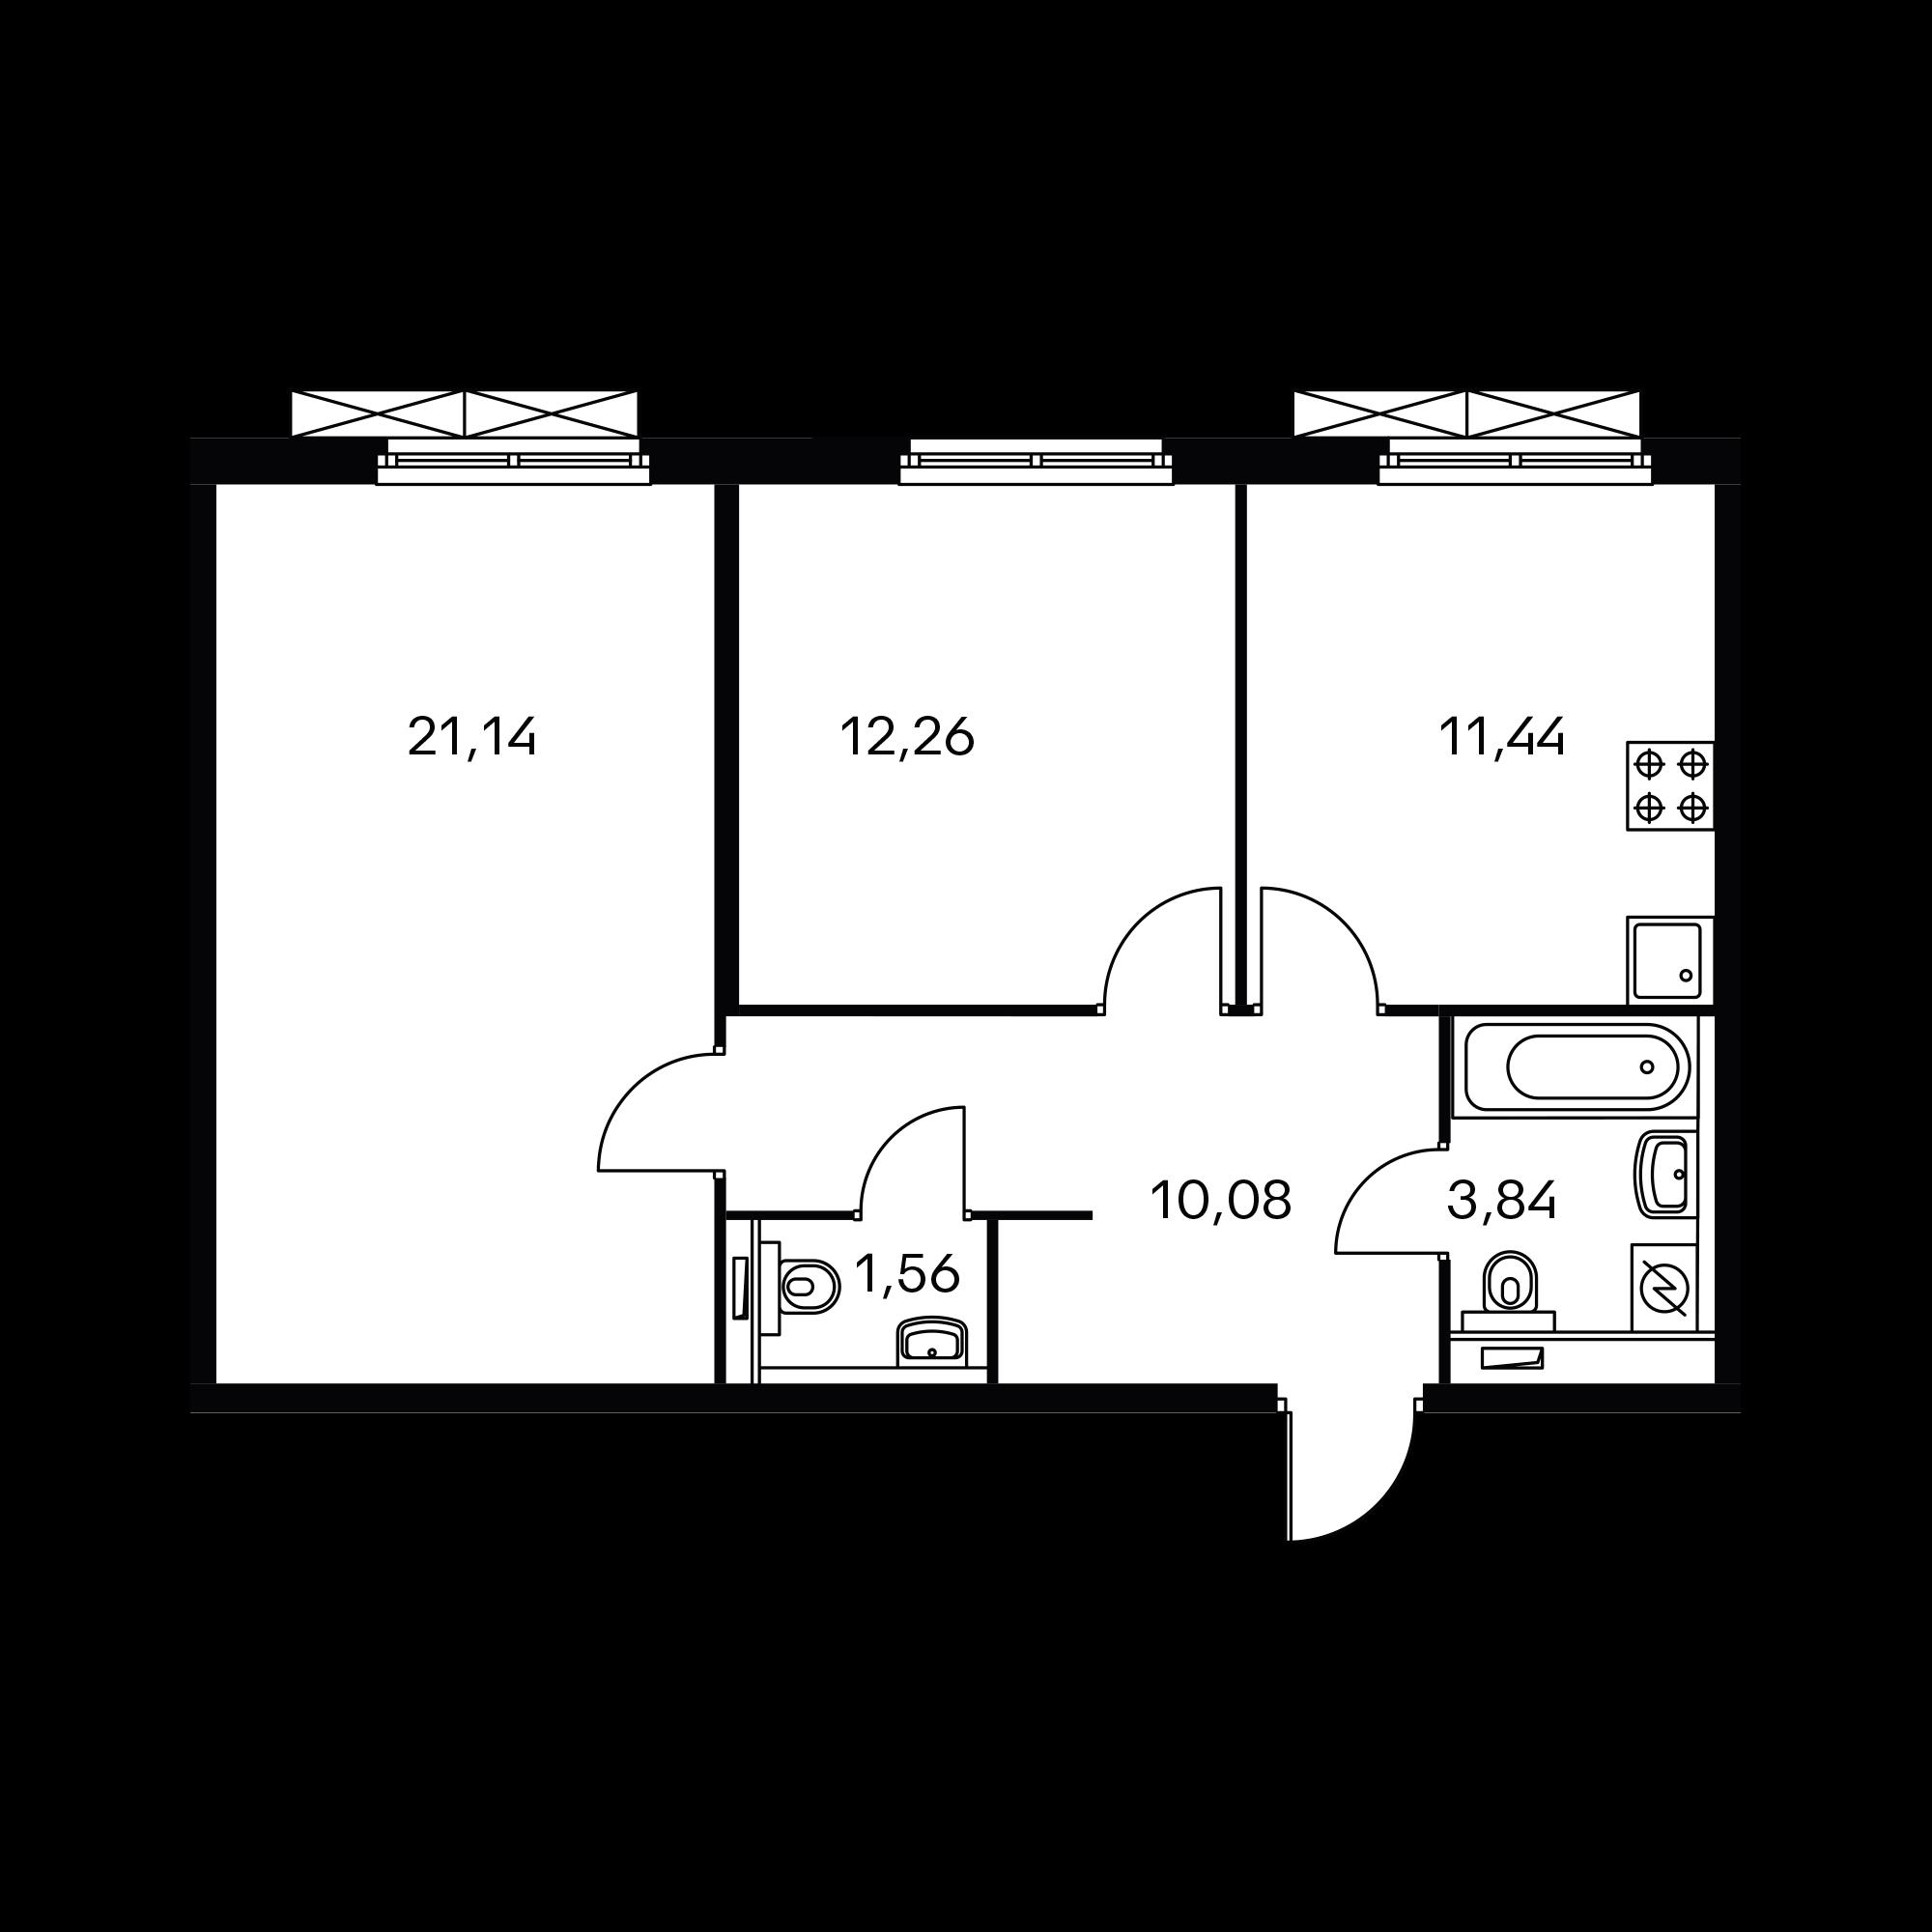 2KM6_10.5-1_S_Z2